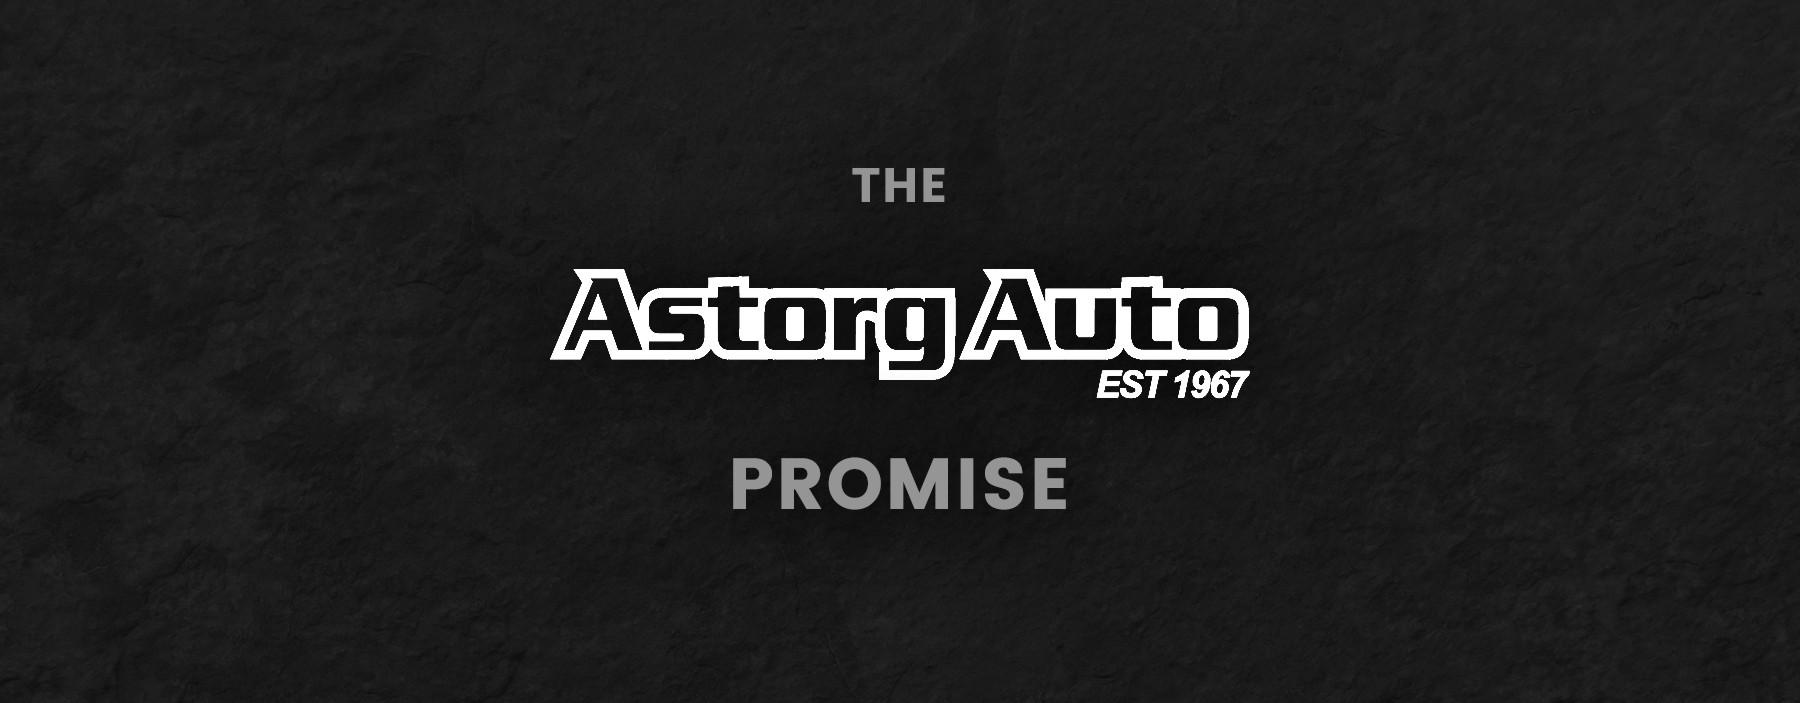 AstorgAuto Promise